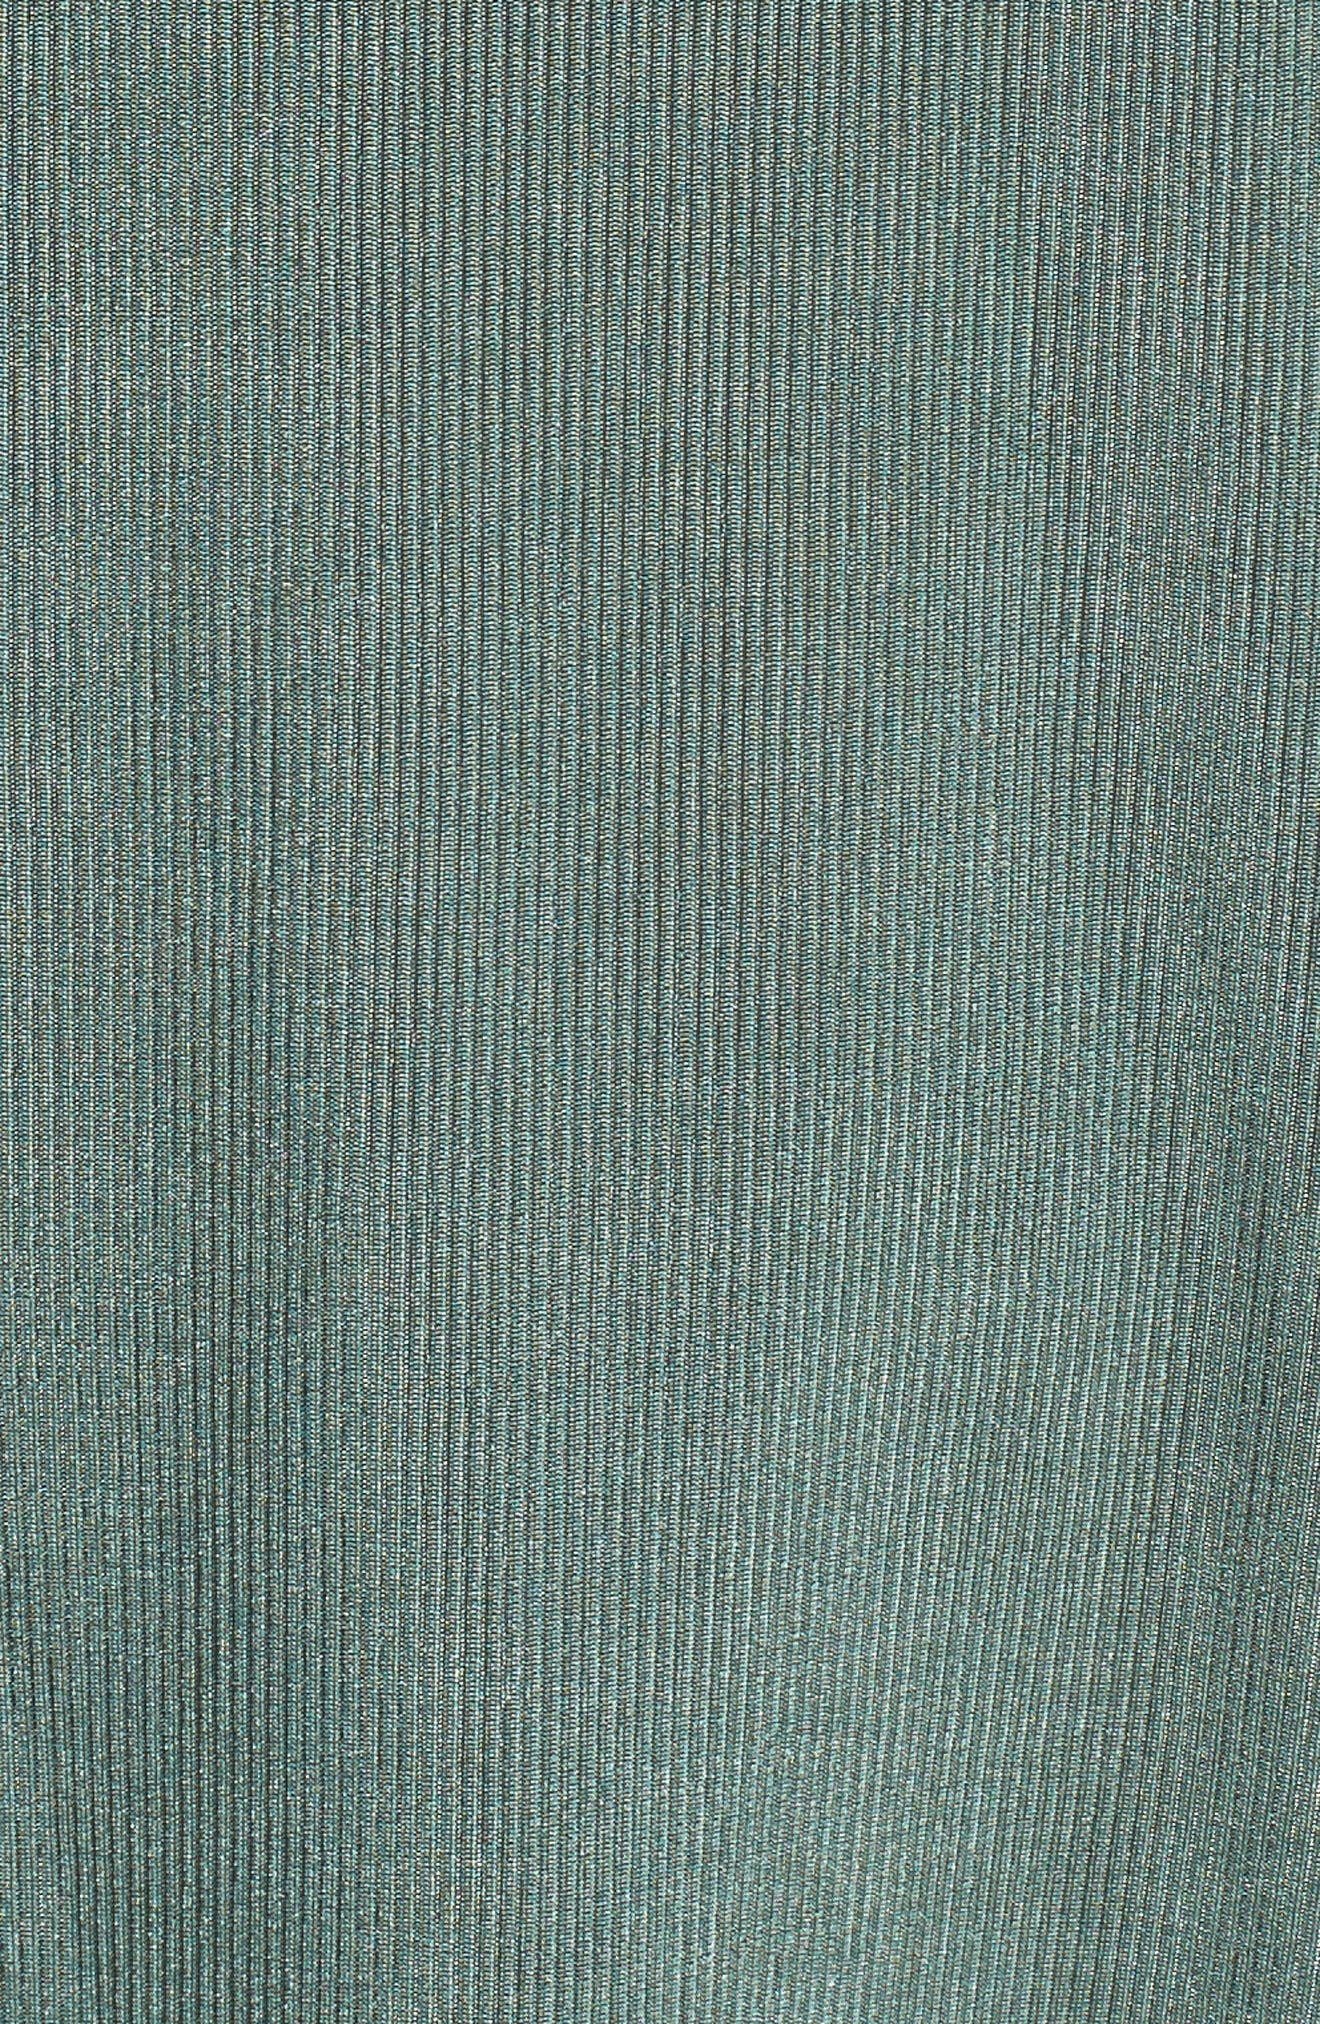 Cold Shoulder Ruffle Top,                             Alternate thumbnail 5, color,                             360